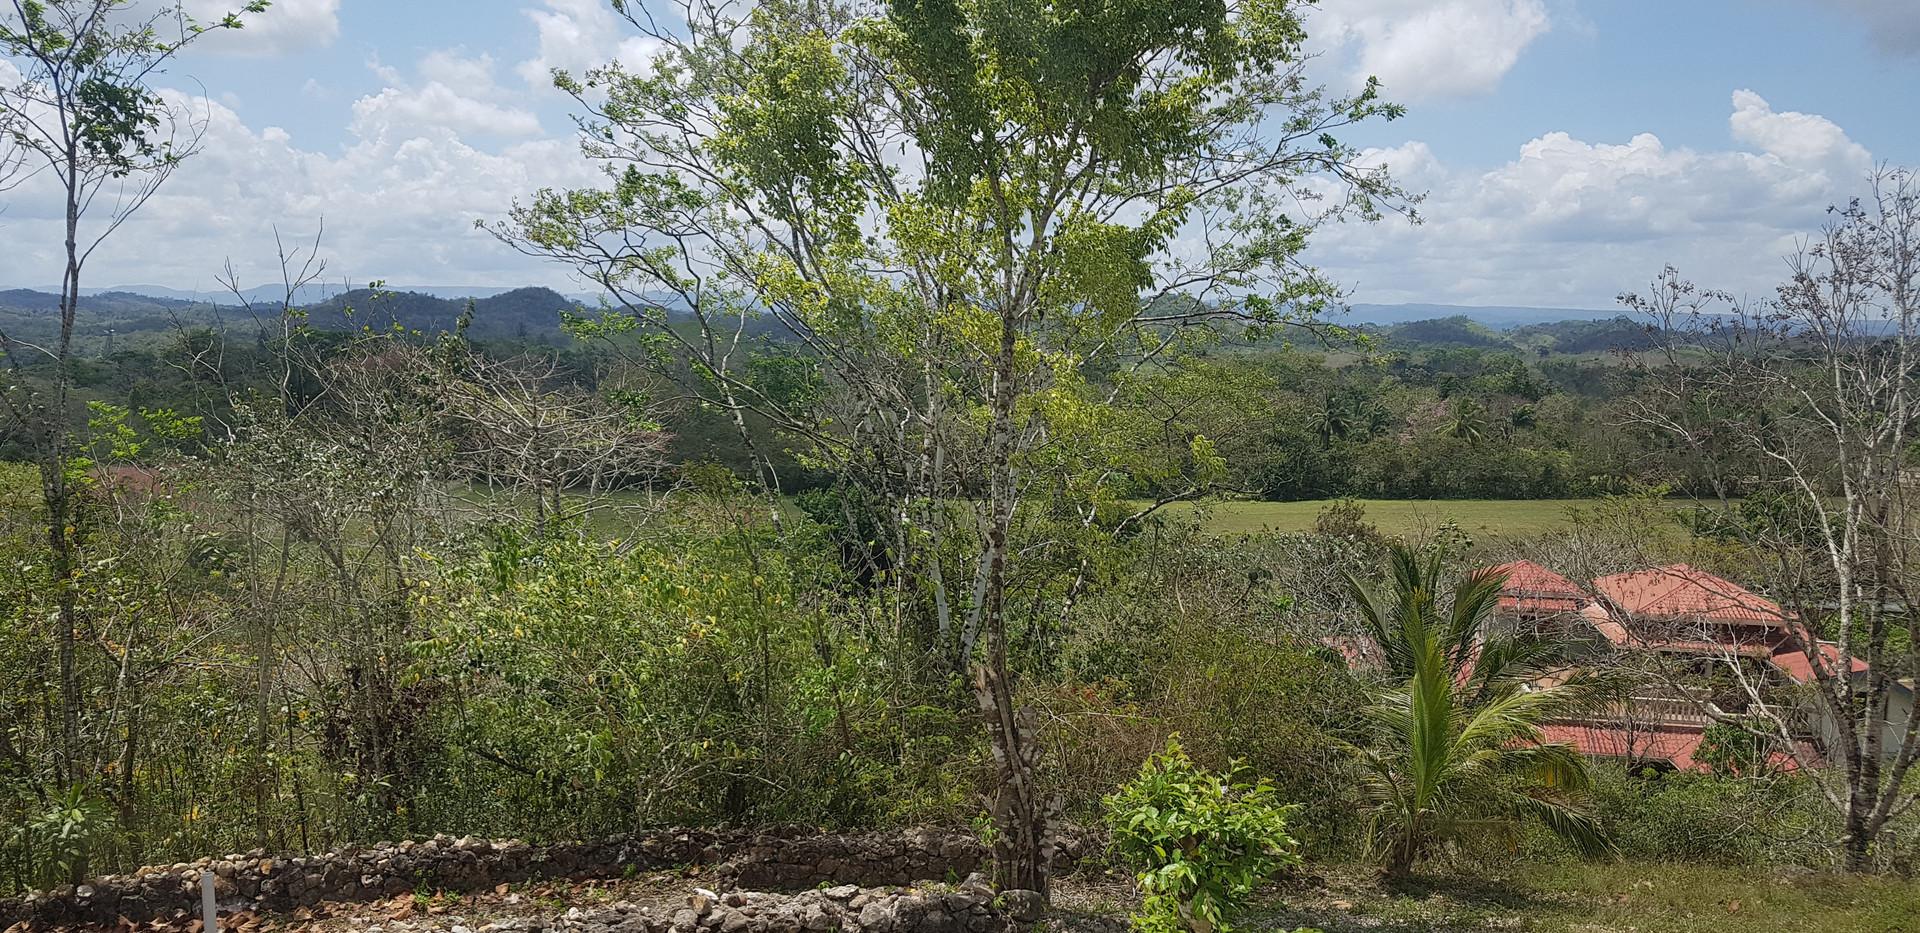 Hilltop View